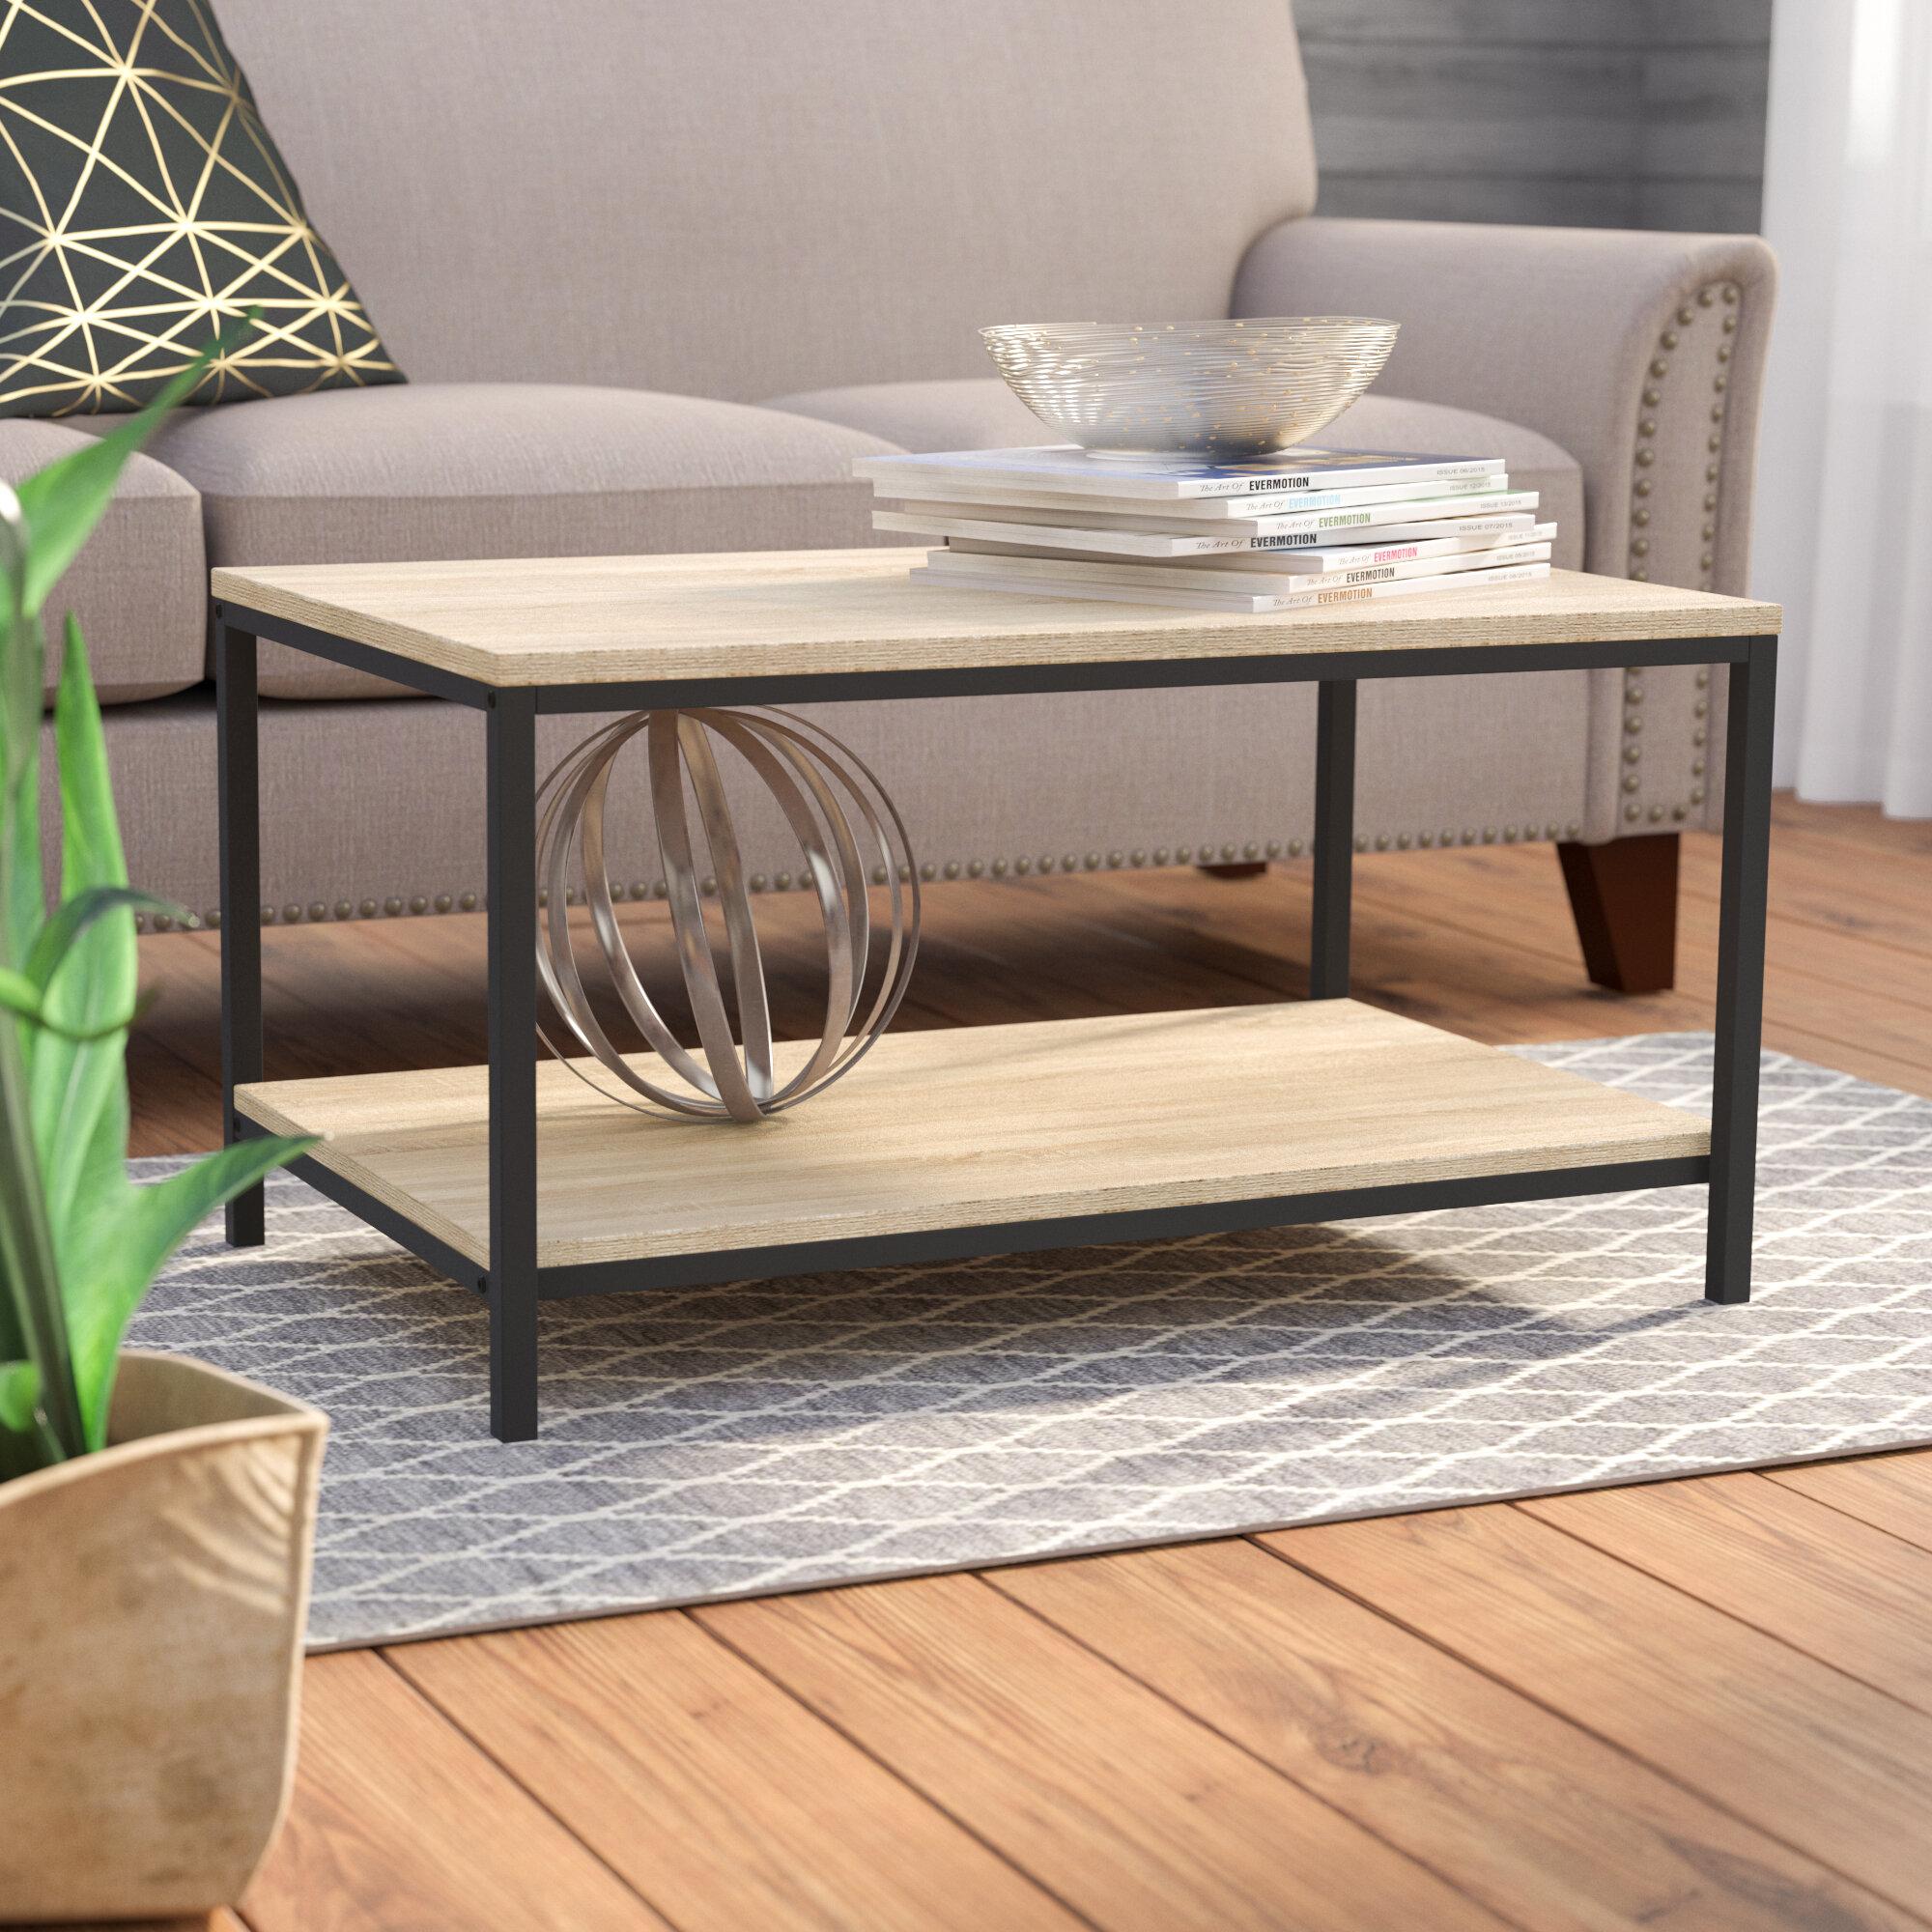 Modern Farmhouse Coffee Tables You Ll Love In 2021 Wayfair